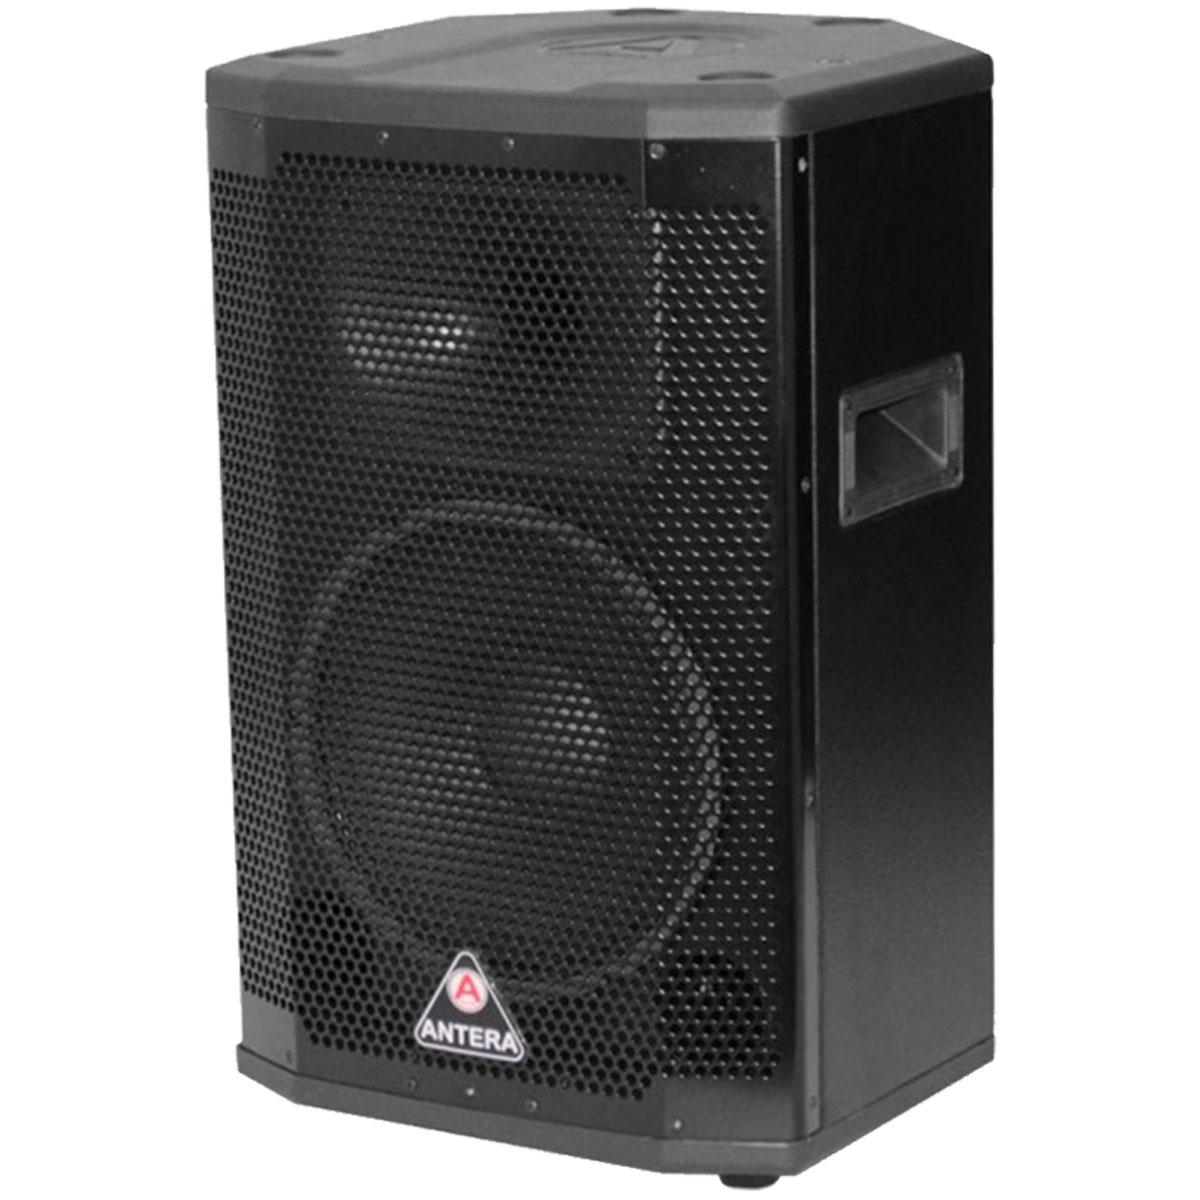 Caixa Ativa Fal 12 Pol 200W - SC 12 AP Plus Antera